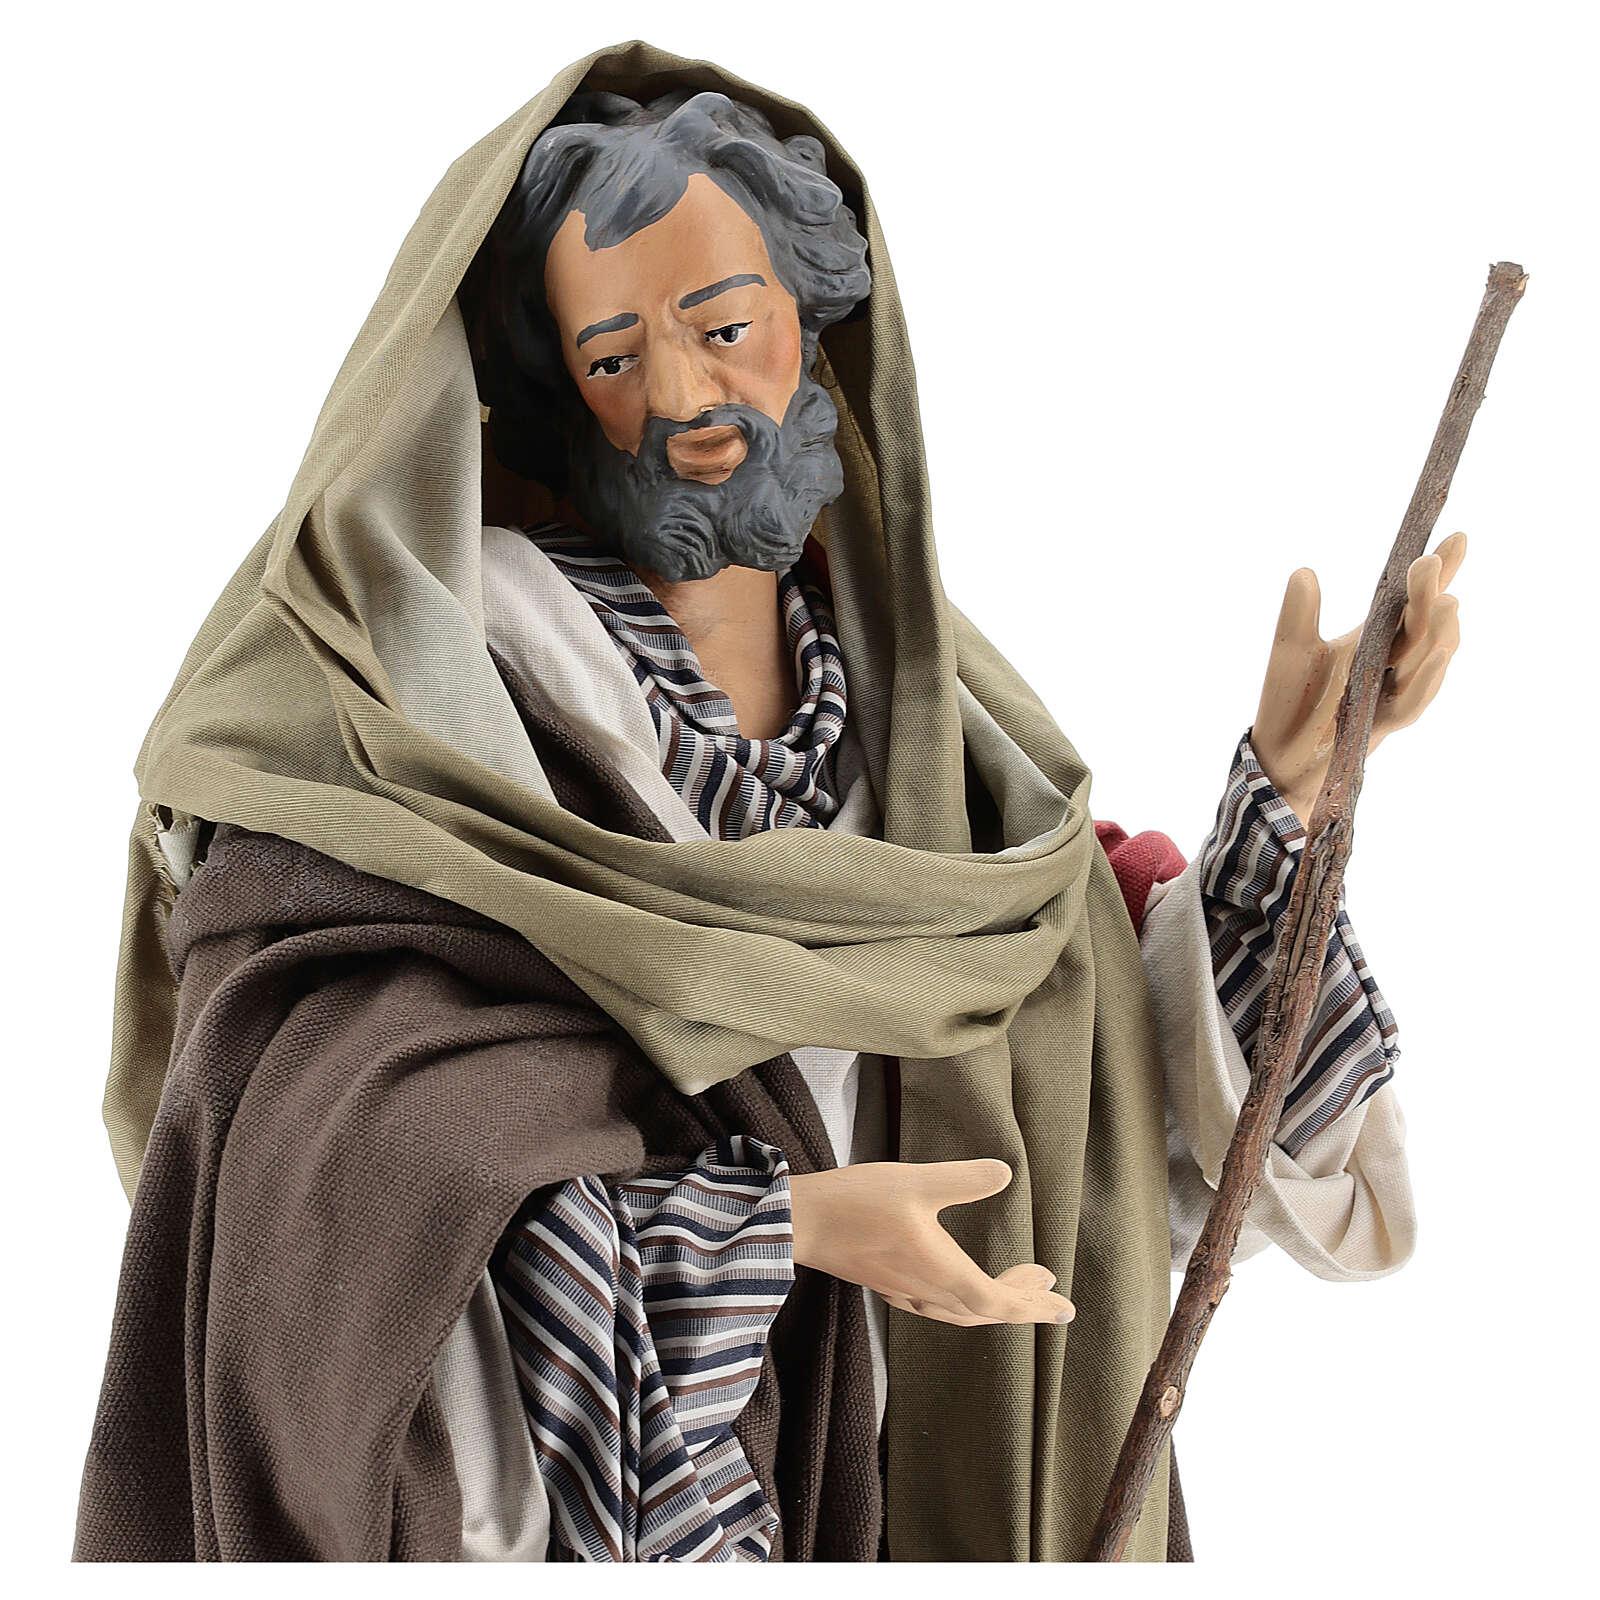 San Giuseppe statua terracotta presepe 50 cm presepe napoletano 4